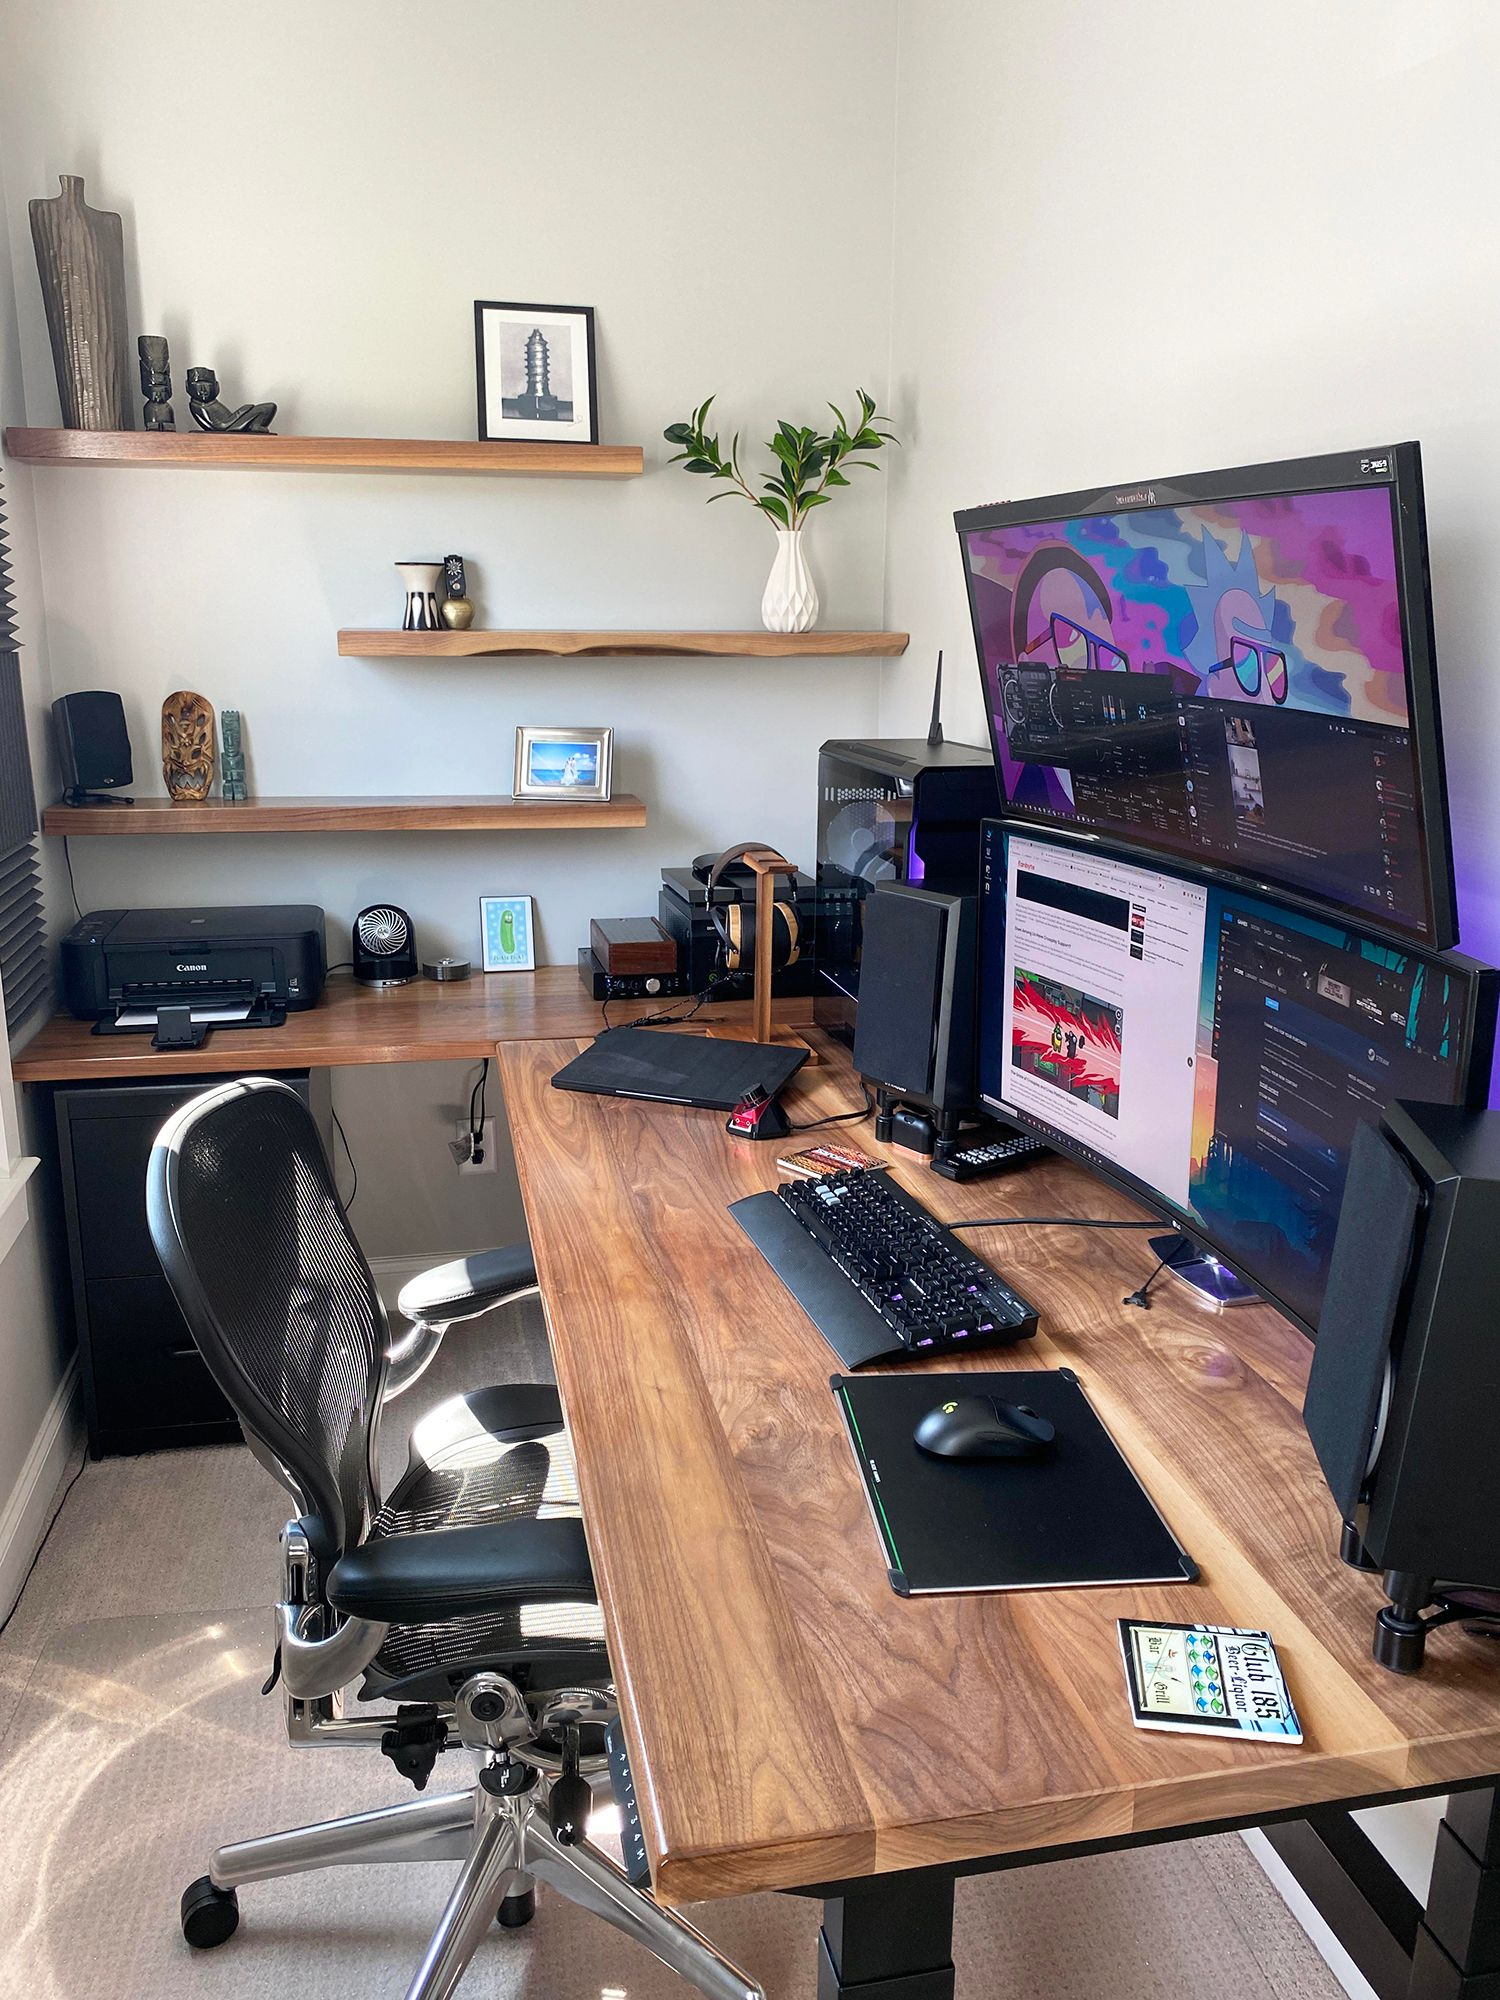 Cloffice setup inspiration. BuckeyeSouth's WFH office featuring an Aeron chair in a converted closet